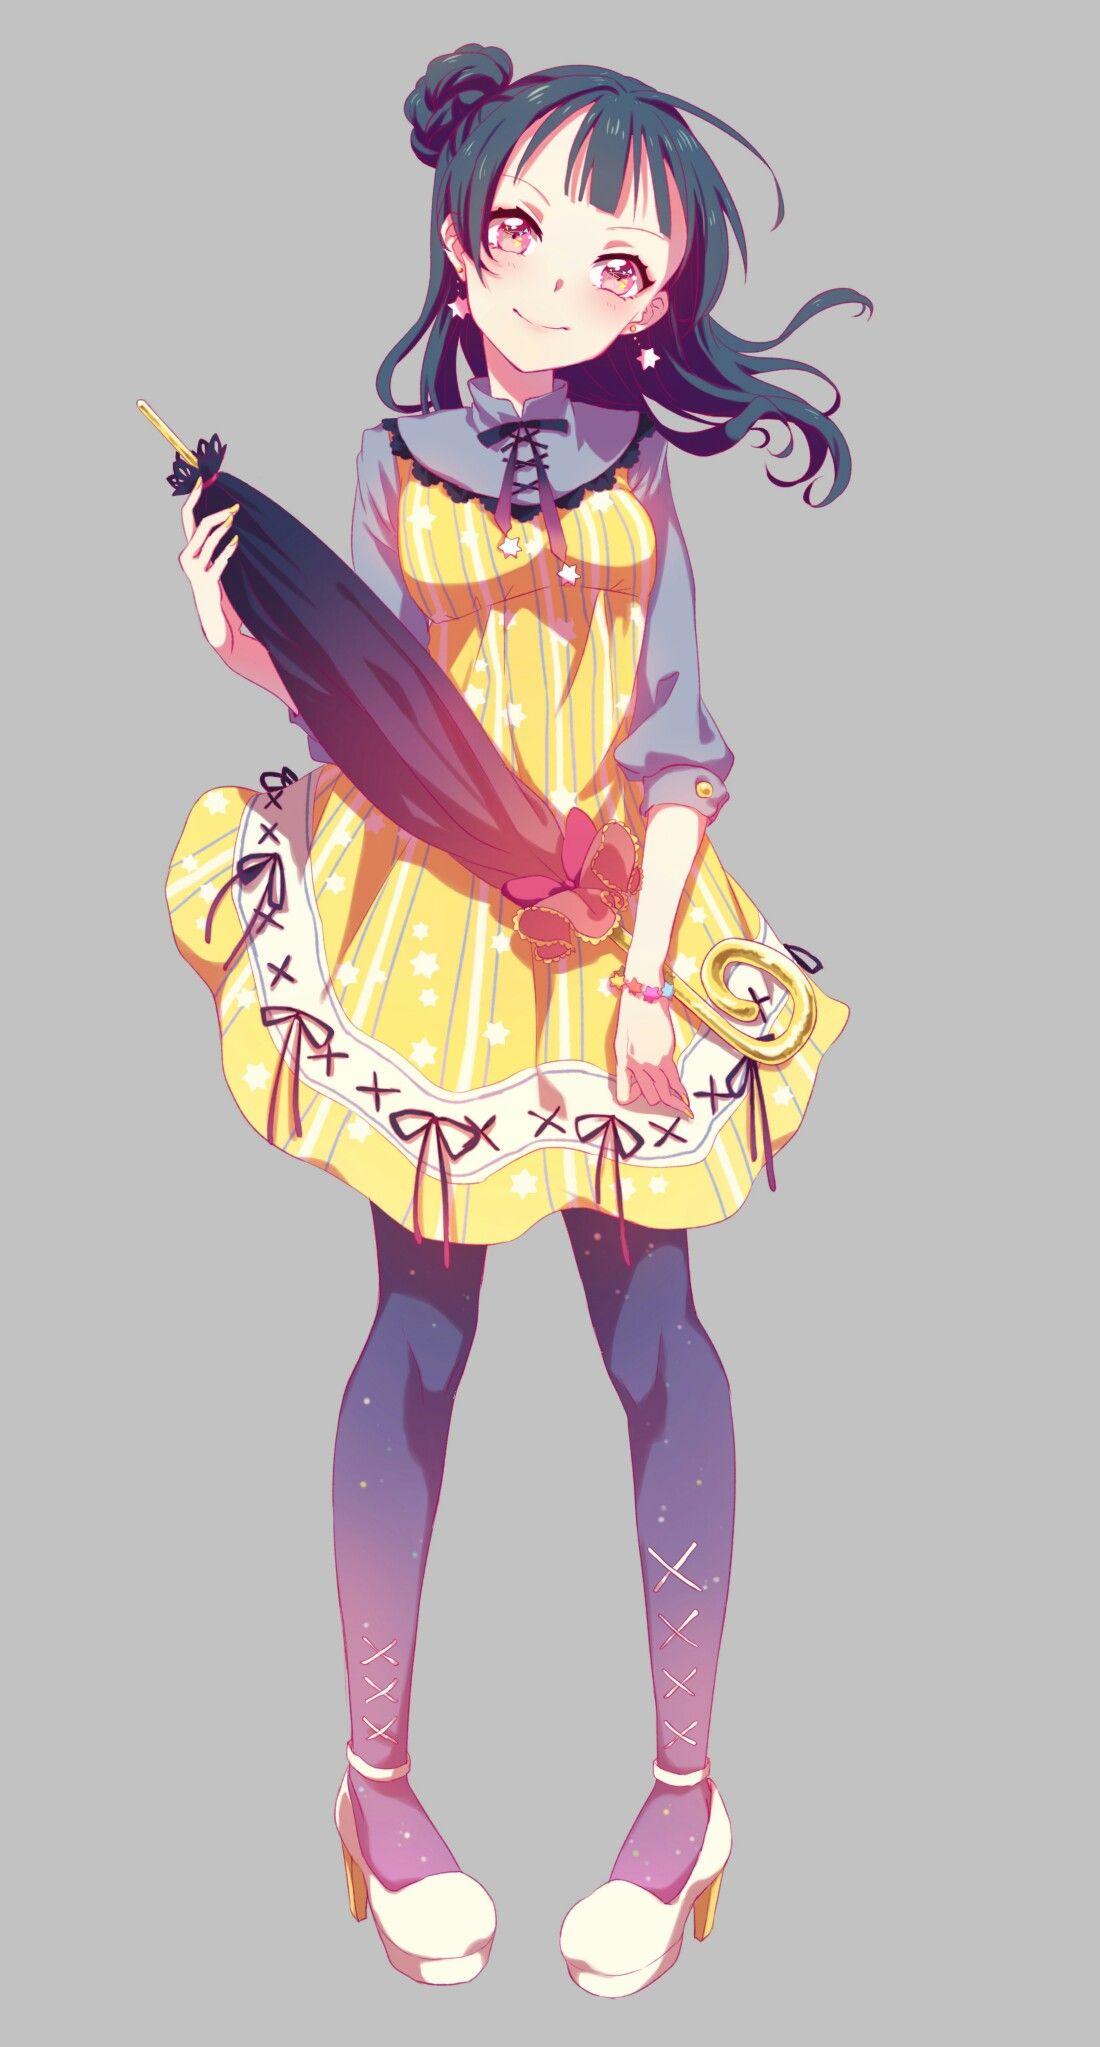 Pin by SugarMint💕 on Love live Beautiful anime girl